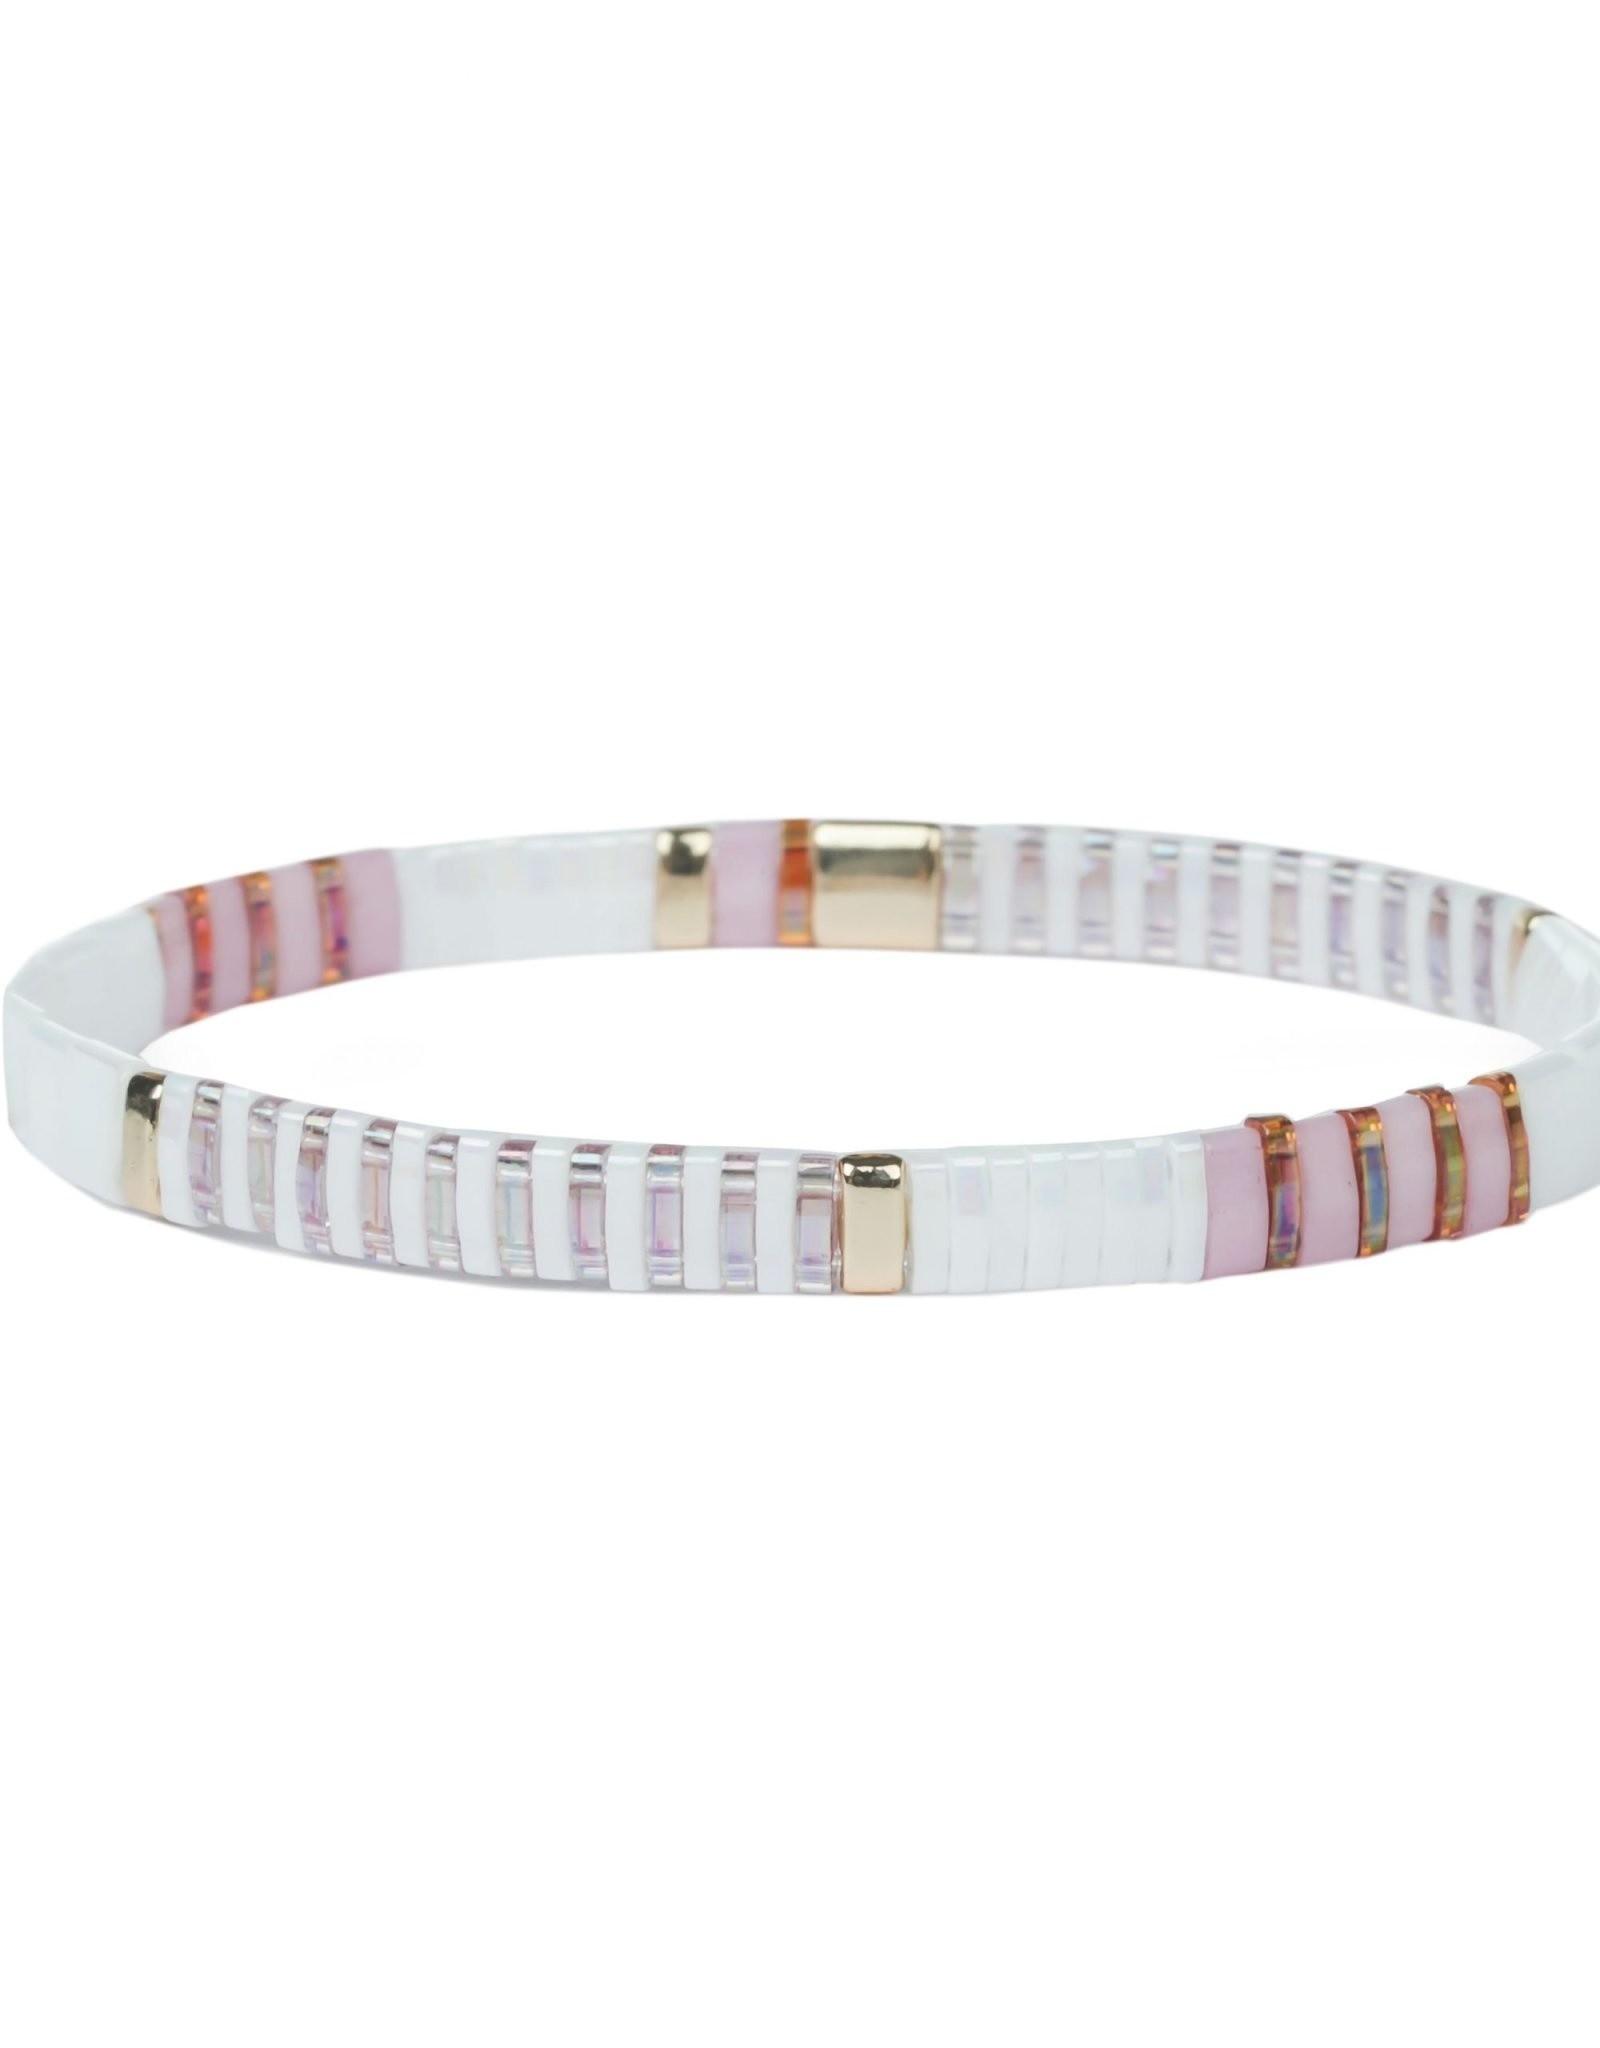 Splendid Iris Tiffany Tila Stretch Bracelet